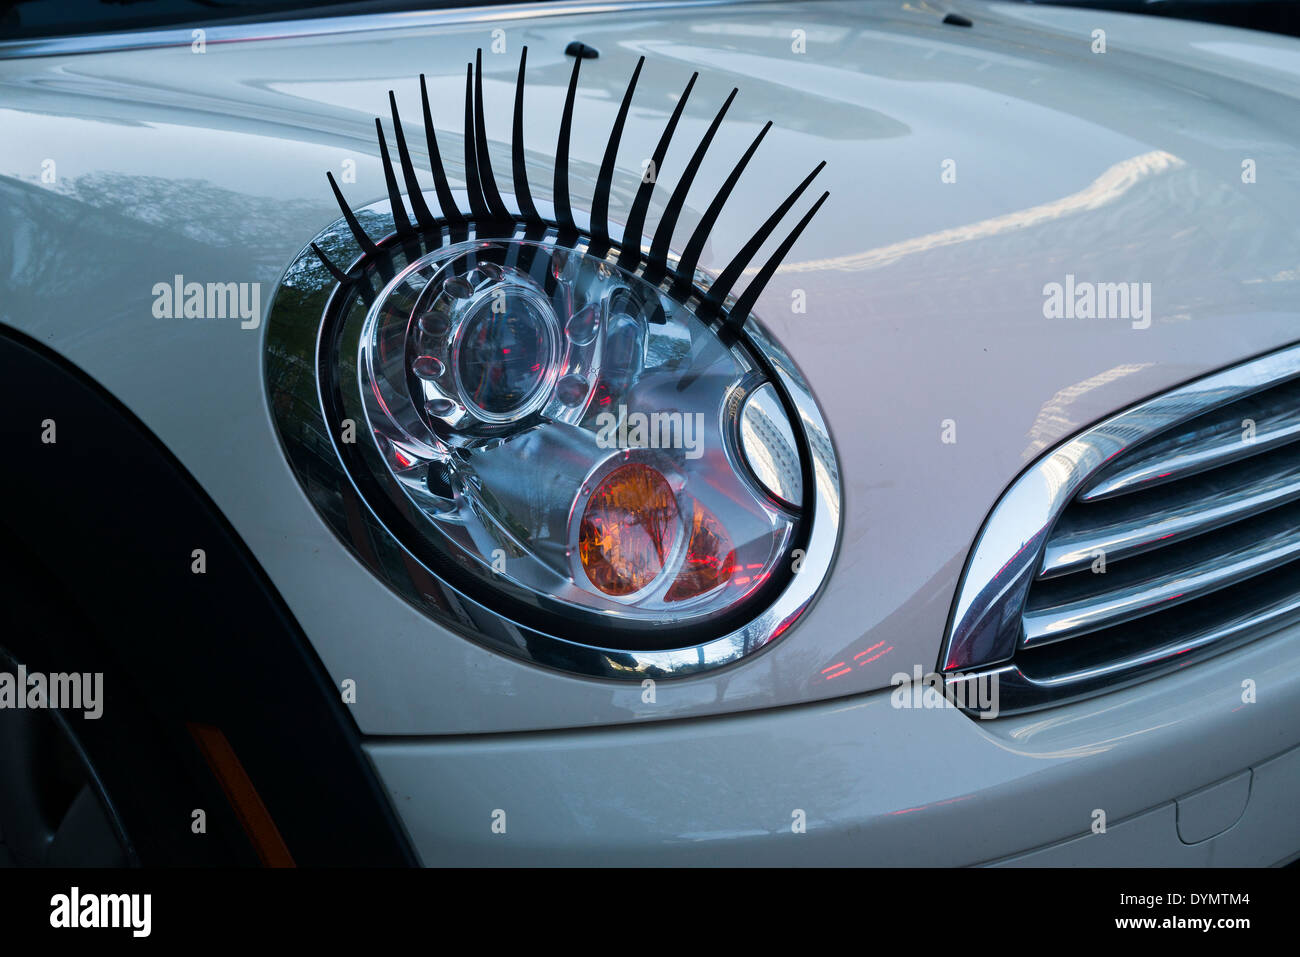 Car Headlights With Eye Lashes Stock Photo 68685236 Alamy